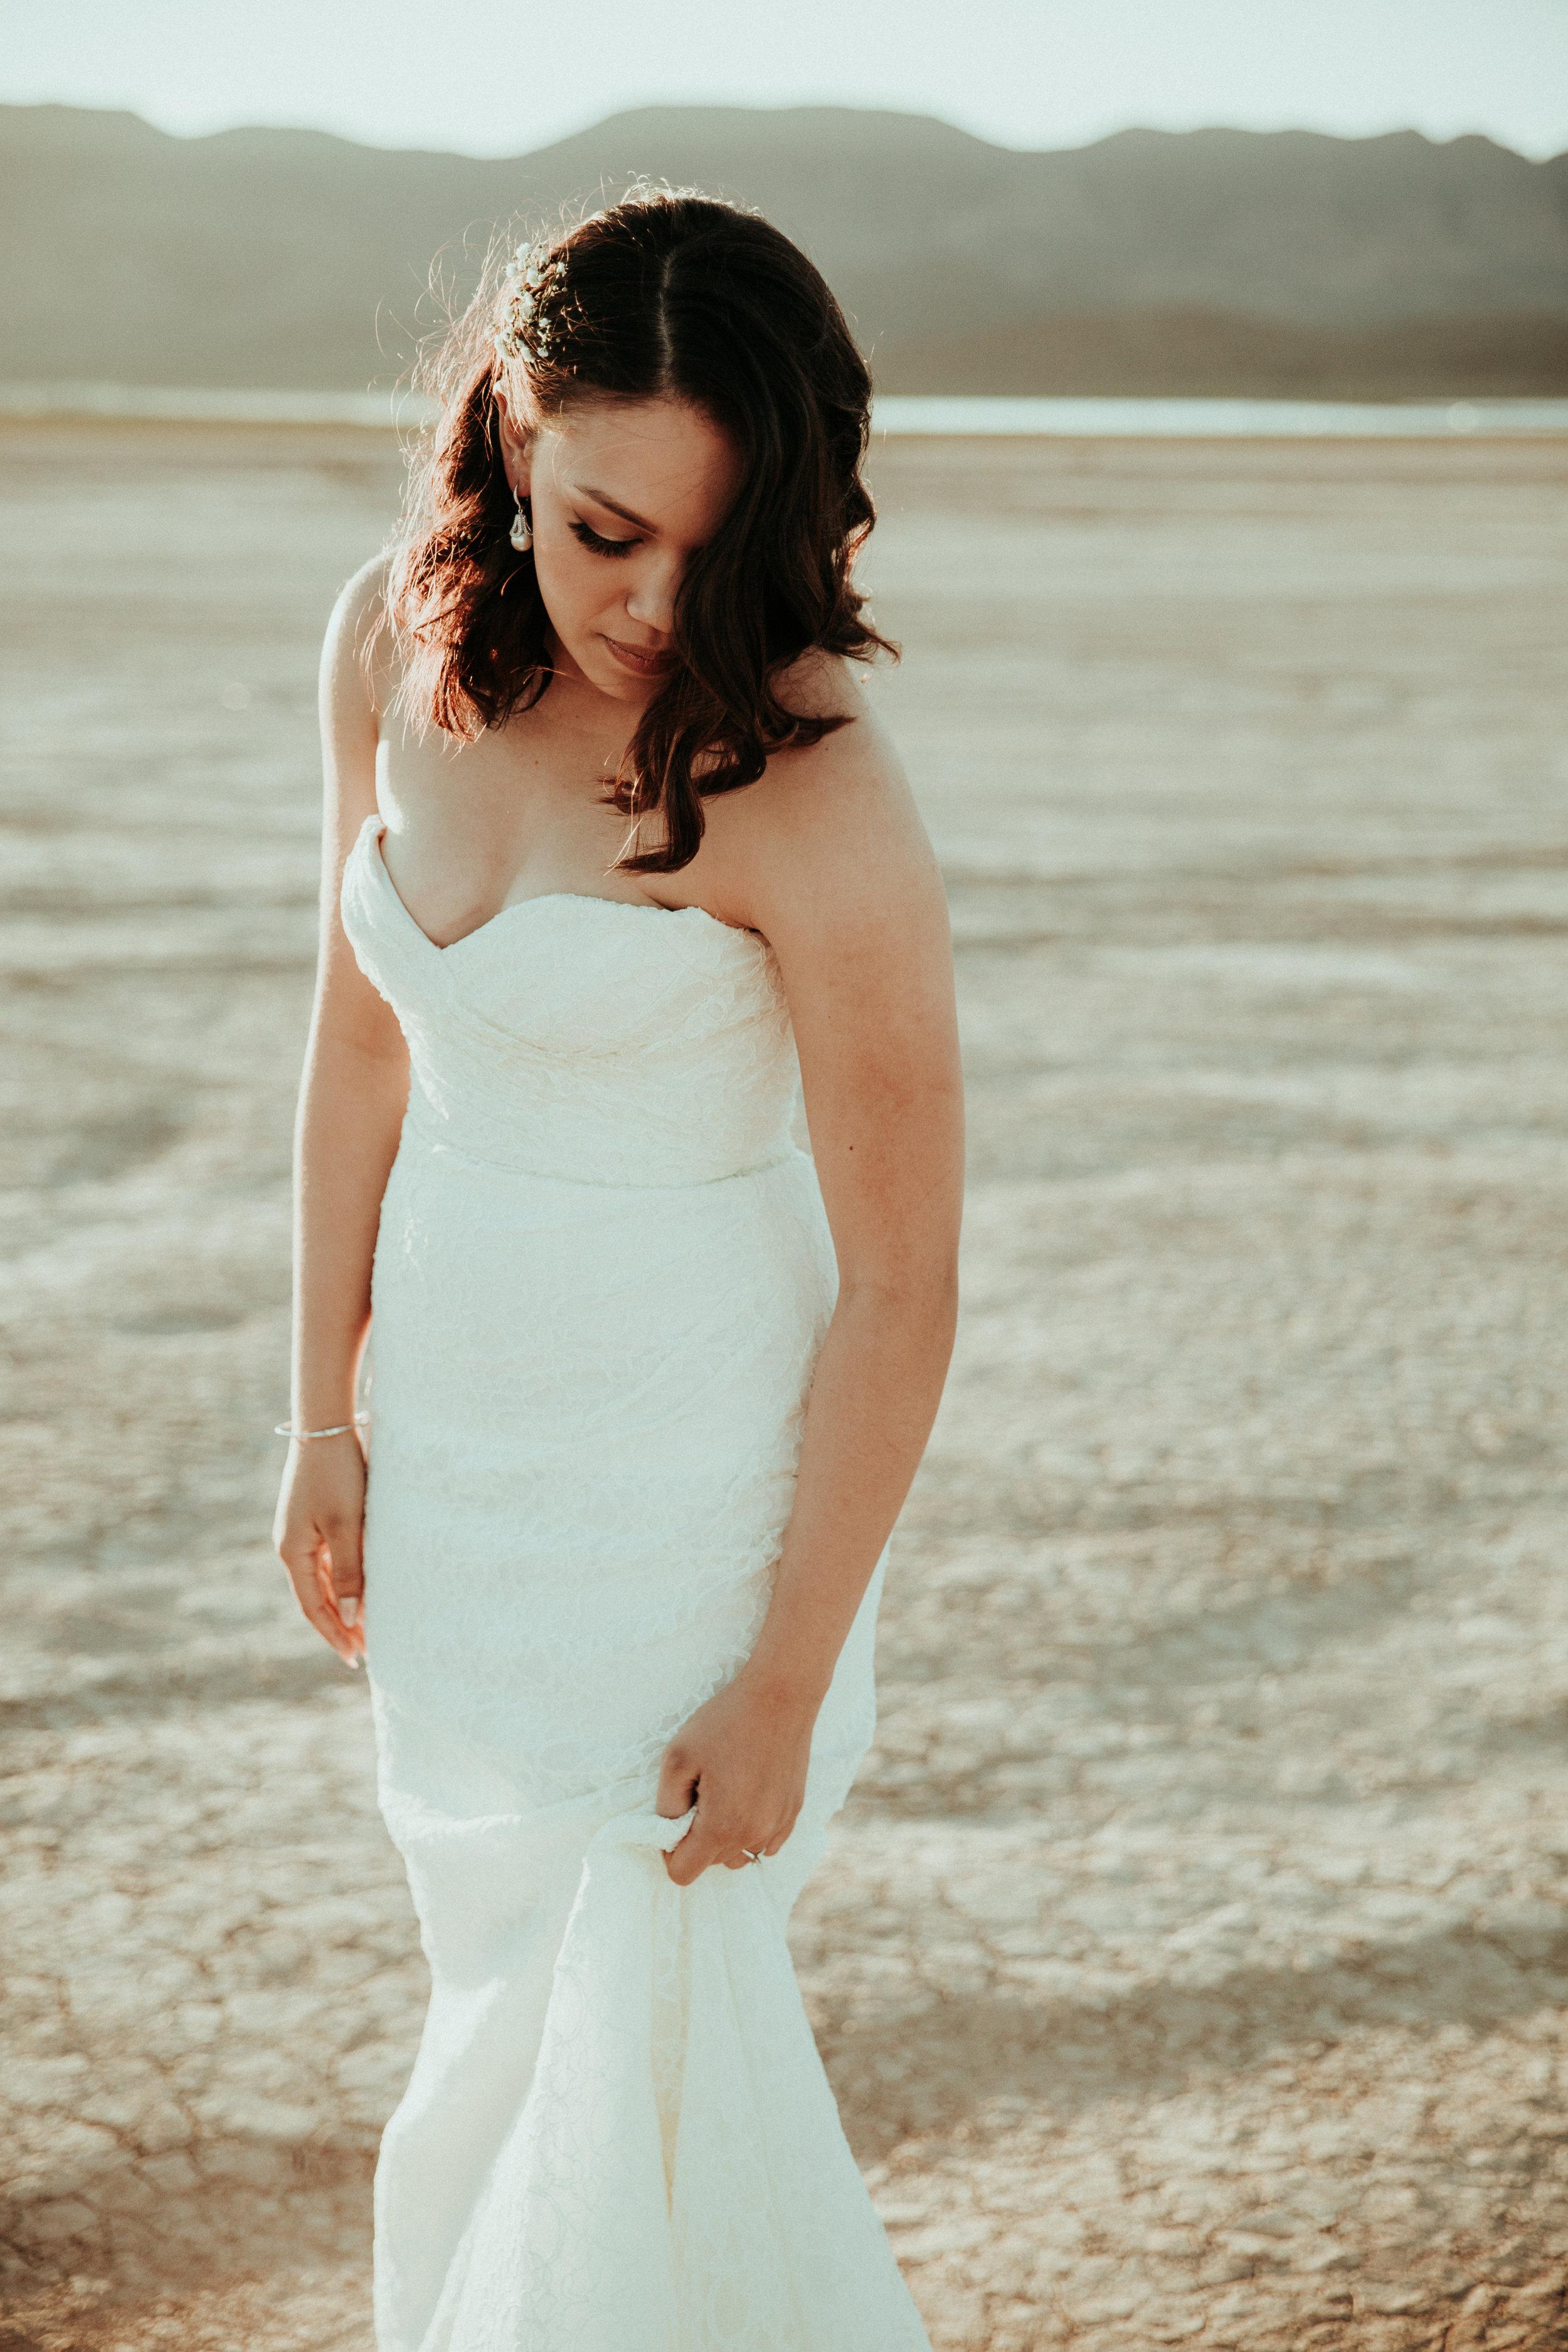 Seattle Wedding Photographer - Las Vegas Wedding Photography - First Look Session - Bridal Portrait - Henderson, NV - Lace Wedding Dress - PNW Wedding Photographer